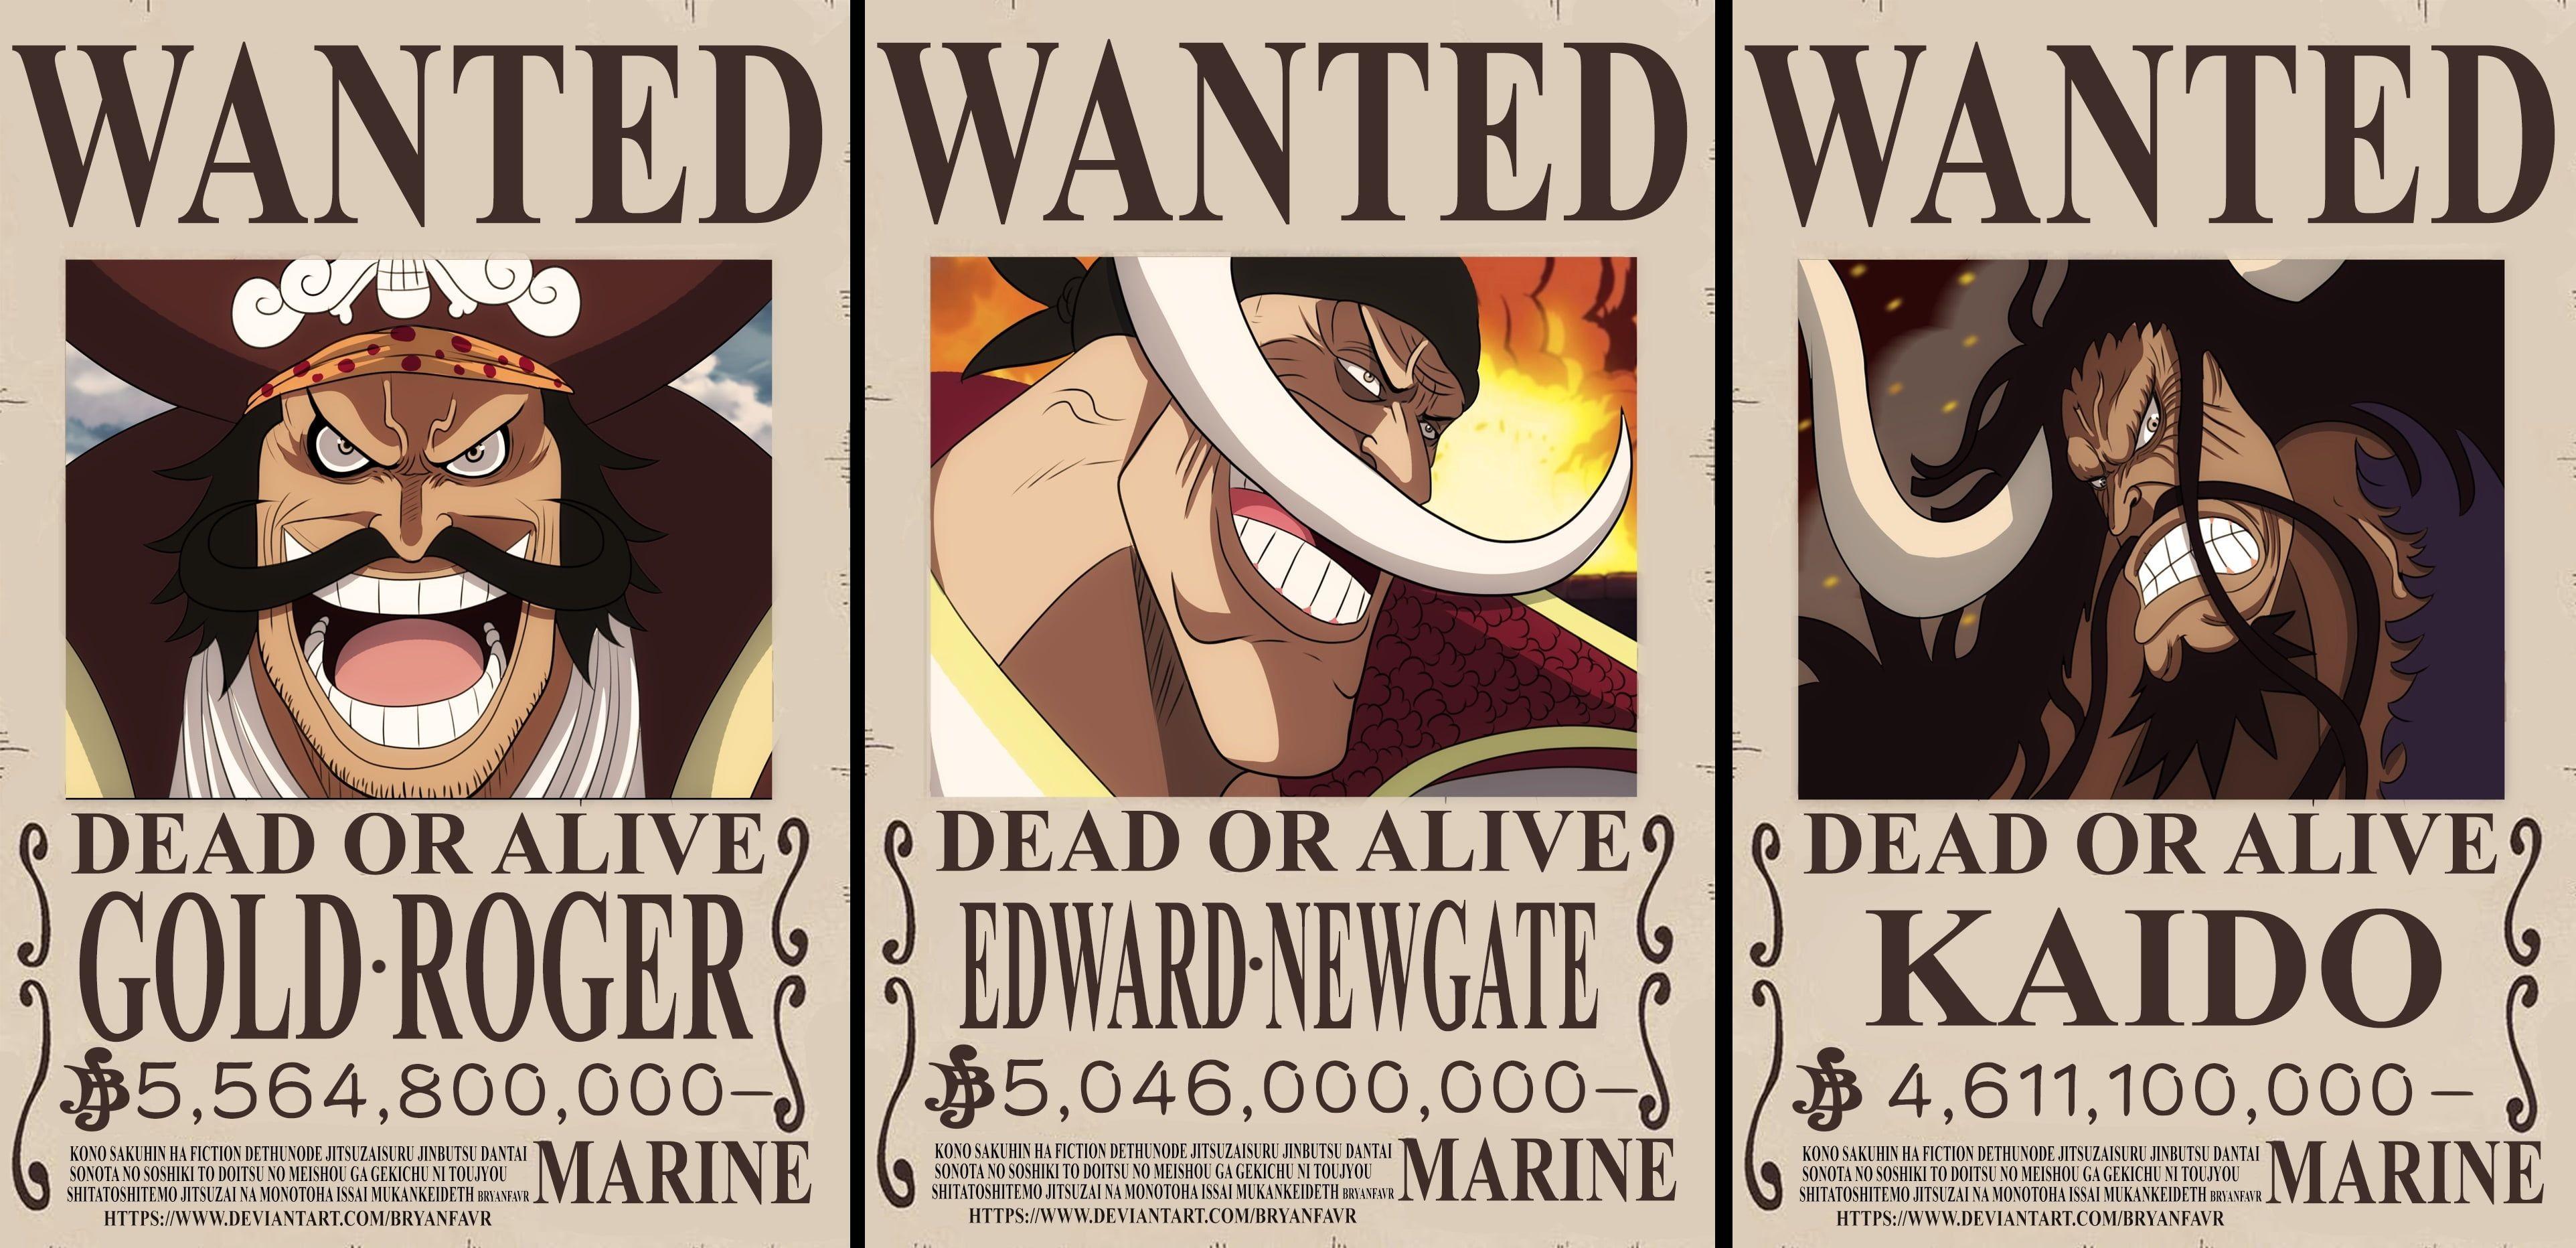 One Piece Edward Newgate Gol D Roger Kaido One Piece 4k Wallpaper Hdwallpaper Desktop In 2020 Kaido One Piece Wallpaper Old Hag